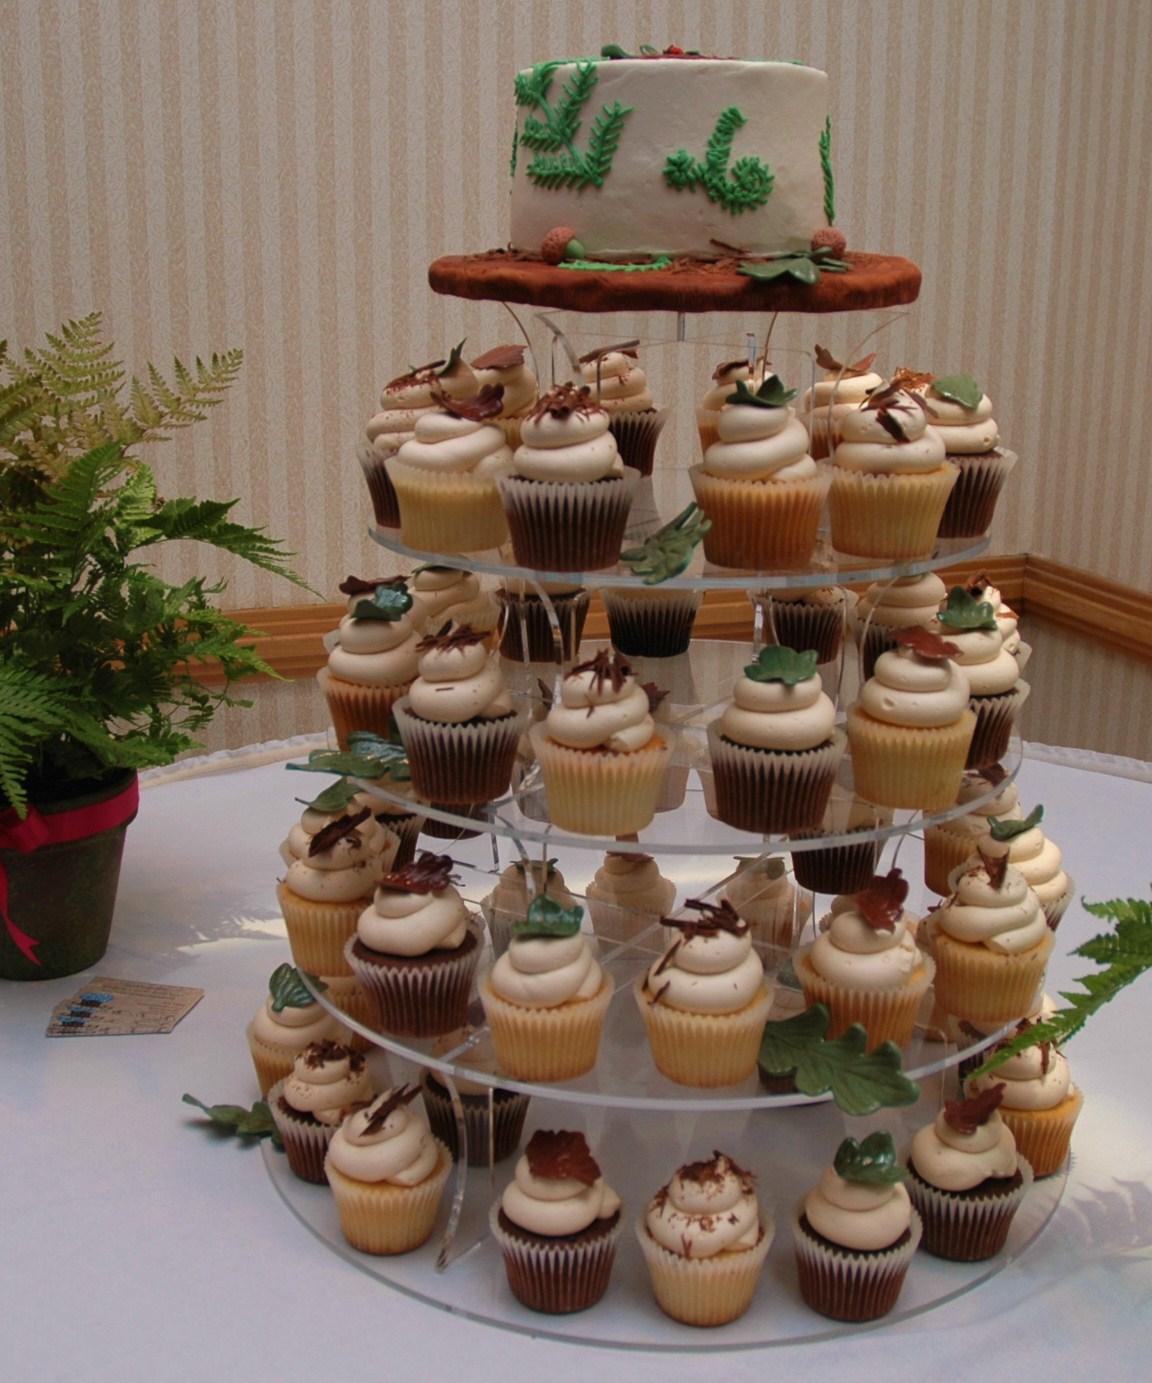 Woodland Themed Wedding Cake: Tara's Cupcakes: Forest Themed Wedding Rehearsal Cake And